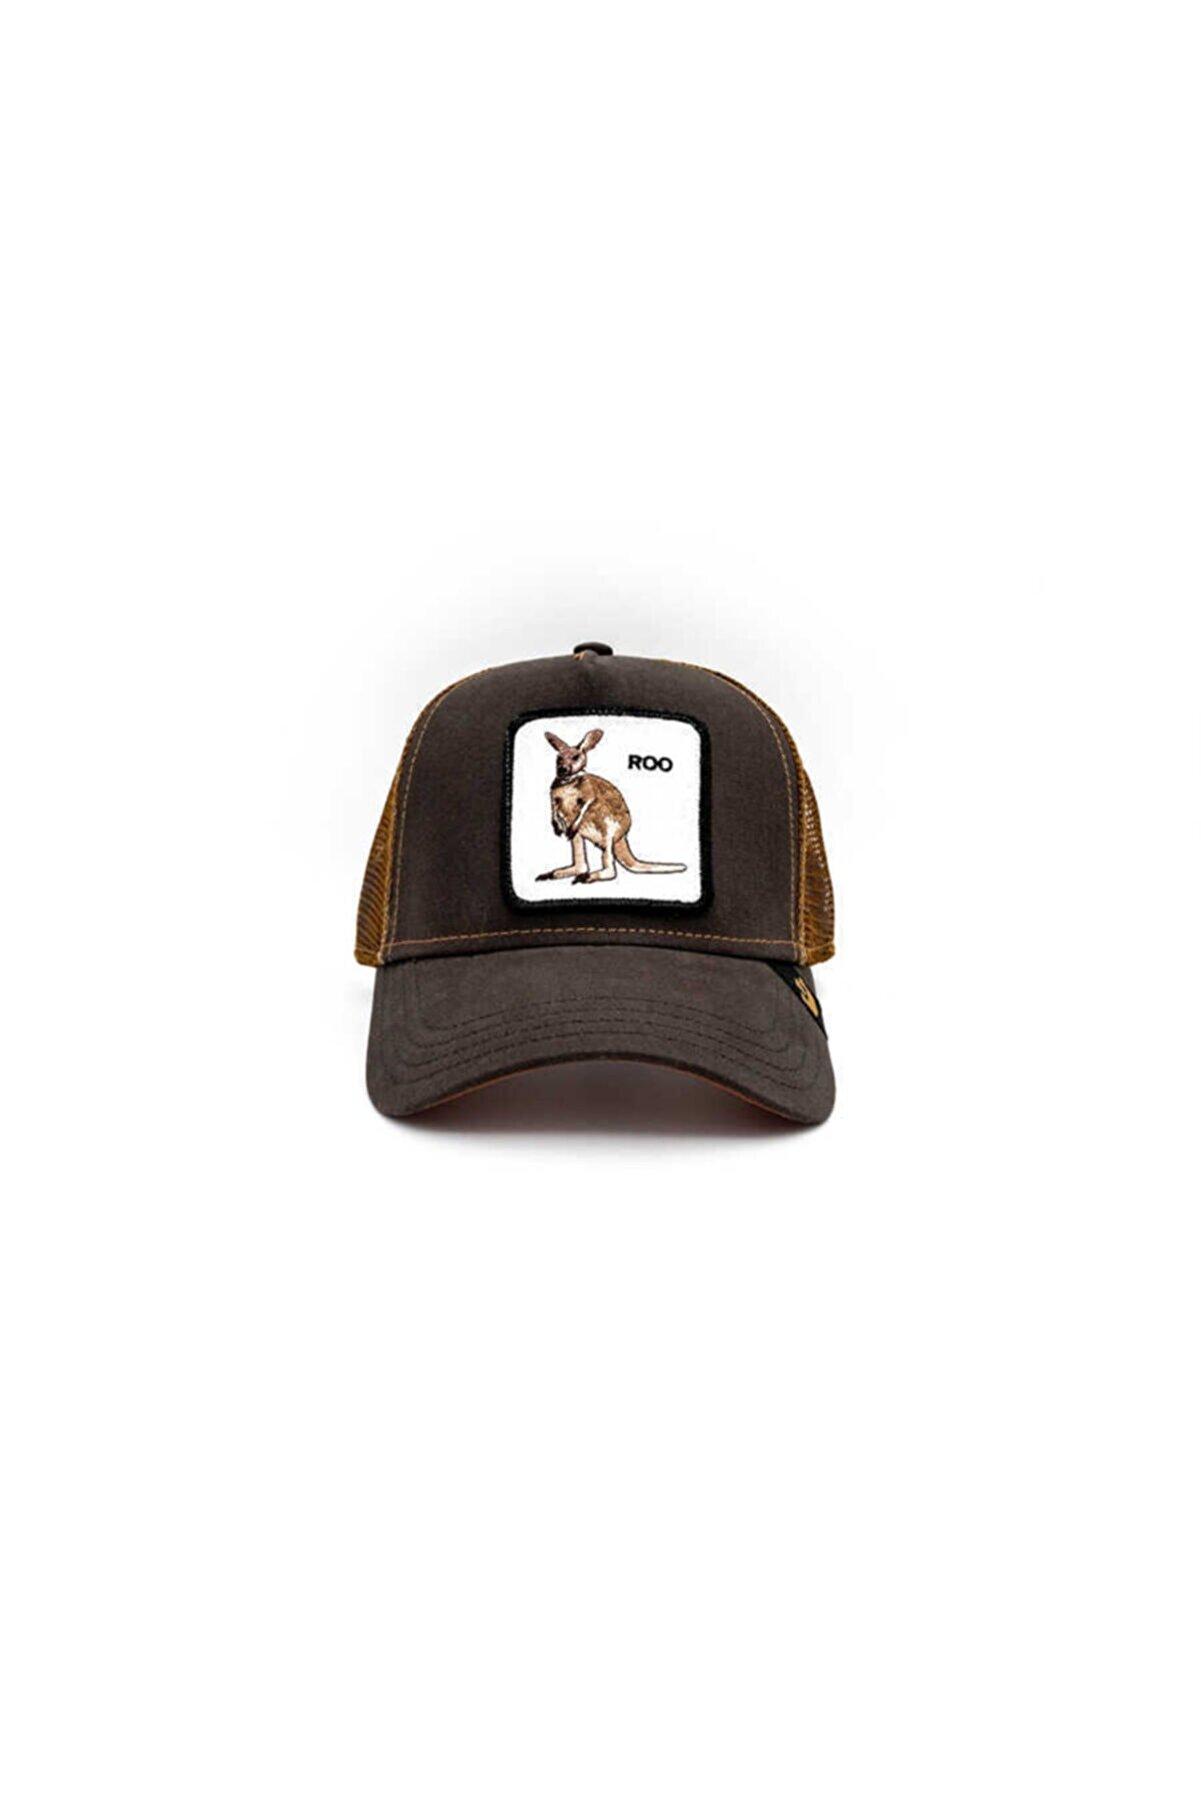 Goorin Bros Roo Kahverengli Şapka 101-0208 Kahverengi Standart